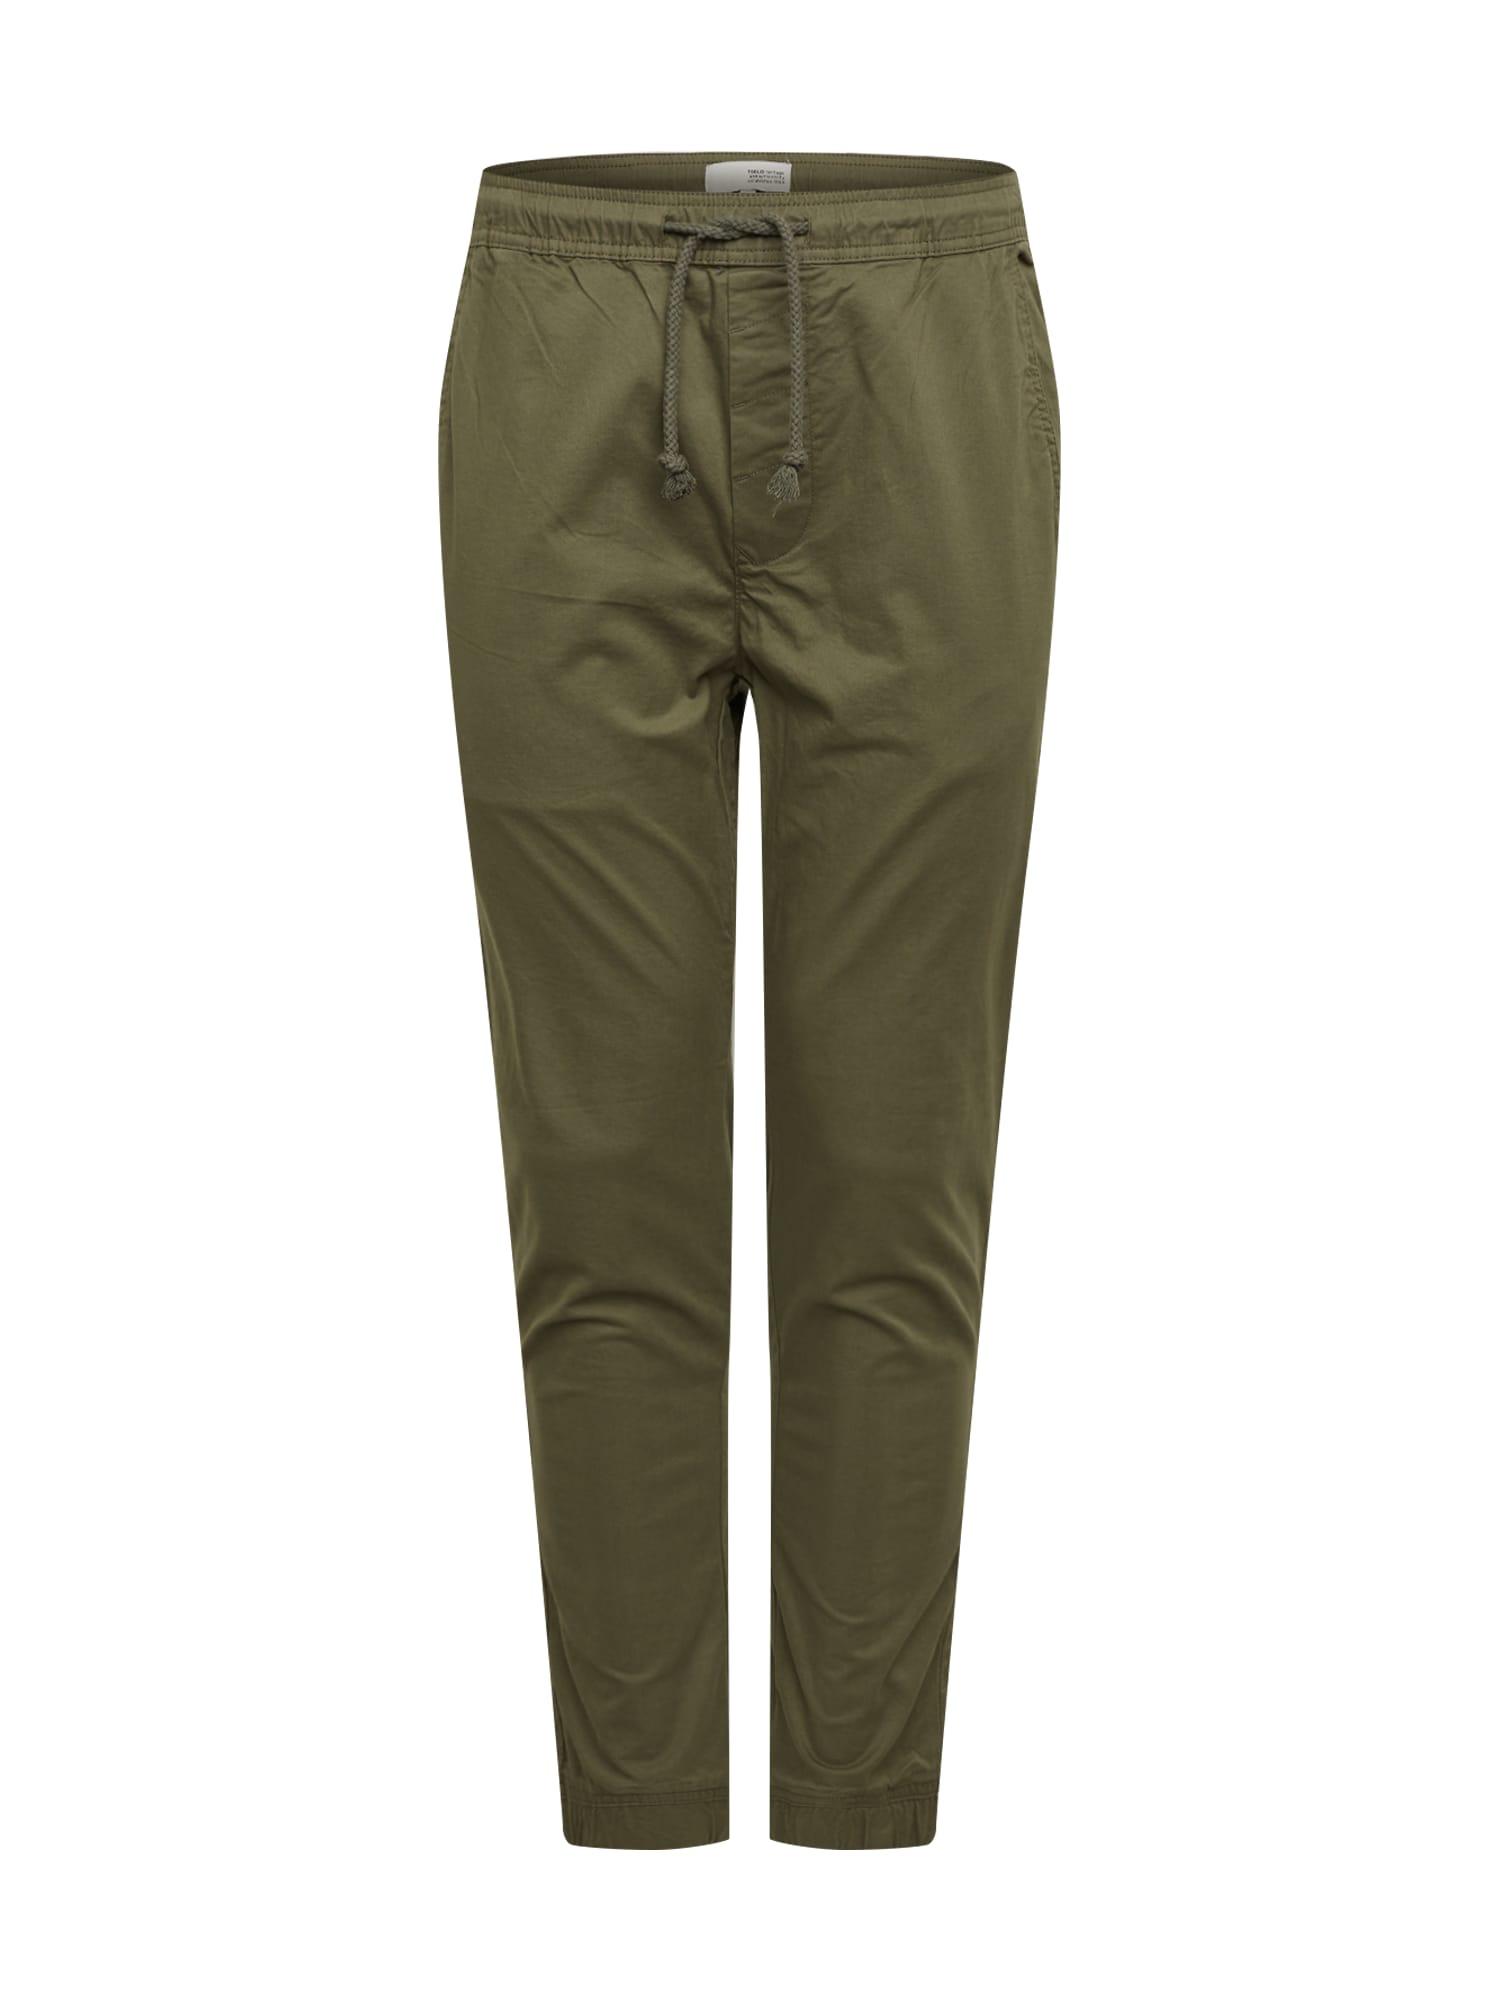 !Solid Pantalon 'Slim-Truc Cuff'  - Vert - Taille: XXL - male